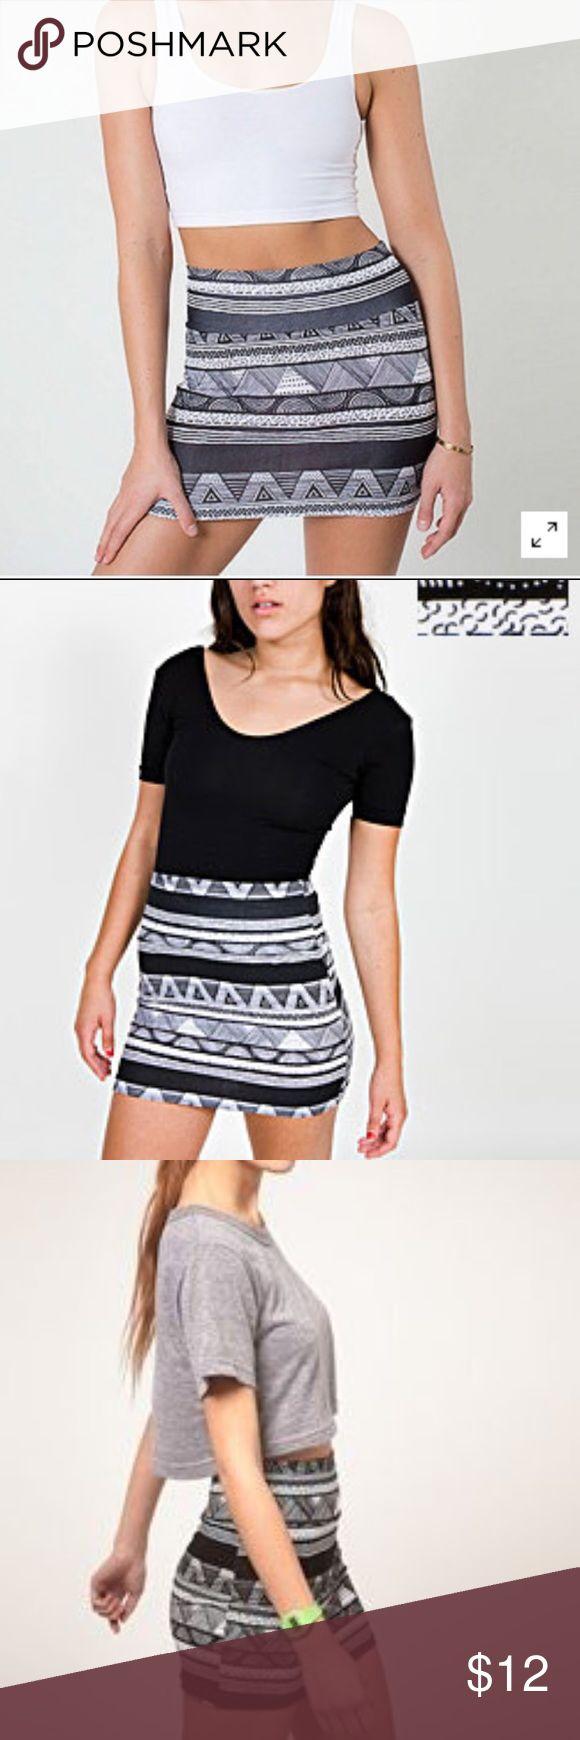 American Apparel Tribal Print Skirt Black and white tribal print American Apparel body-con mini skirt. American Apparel is now out of business. Size small. American Apparel Skirts Mini